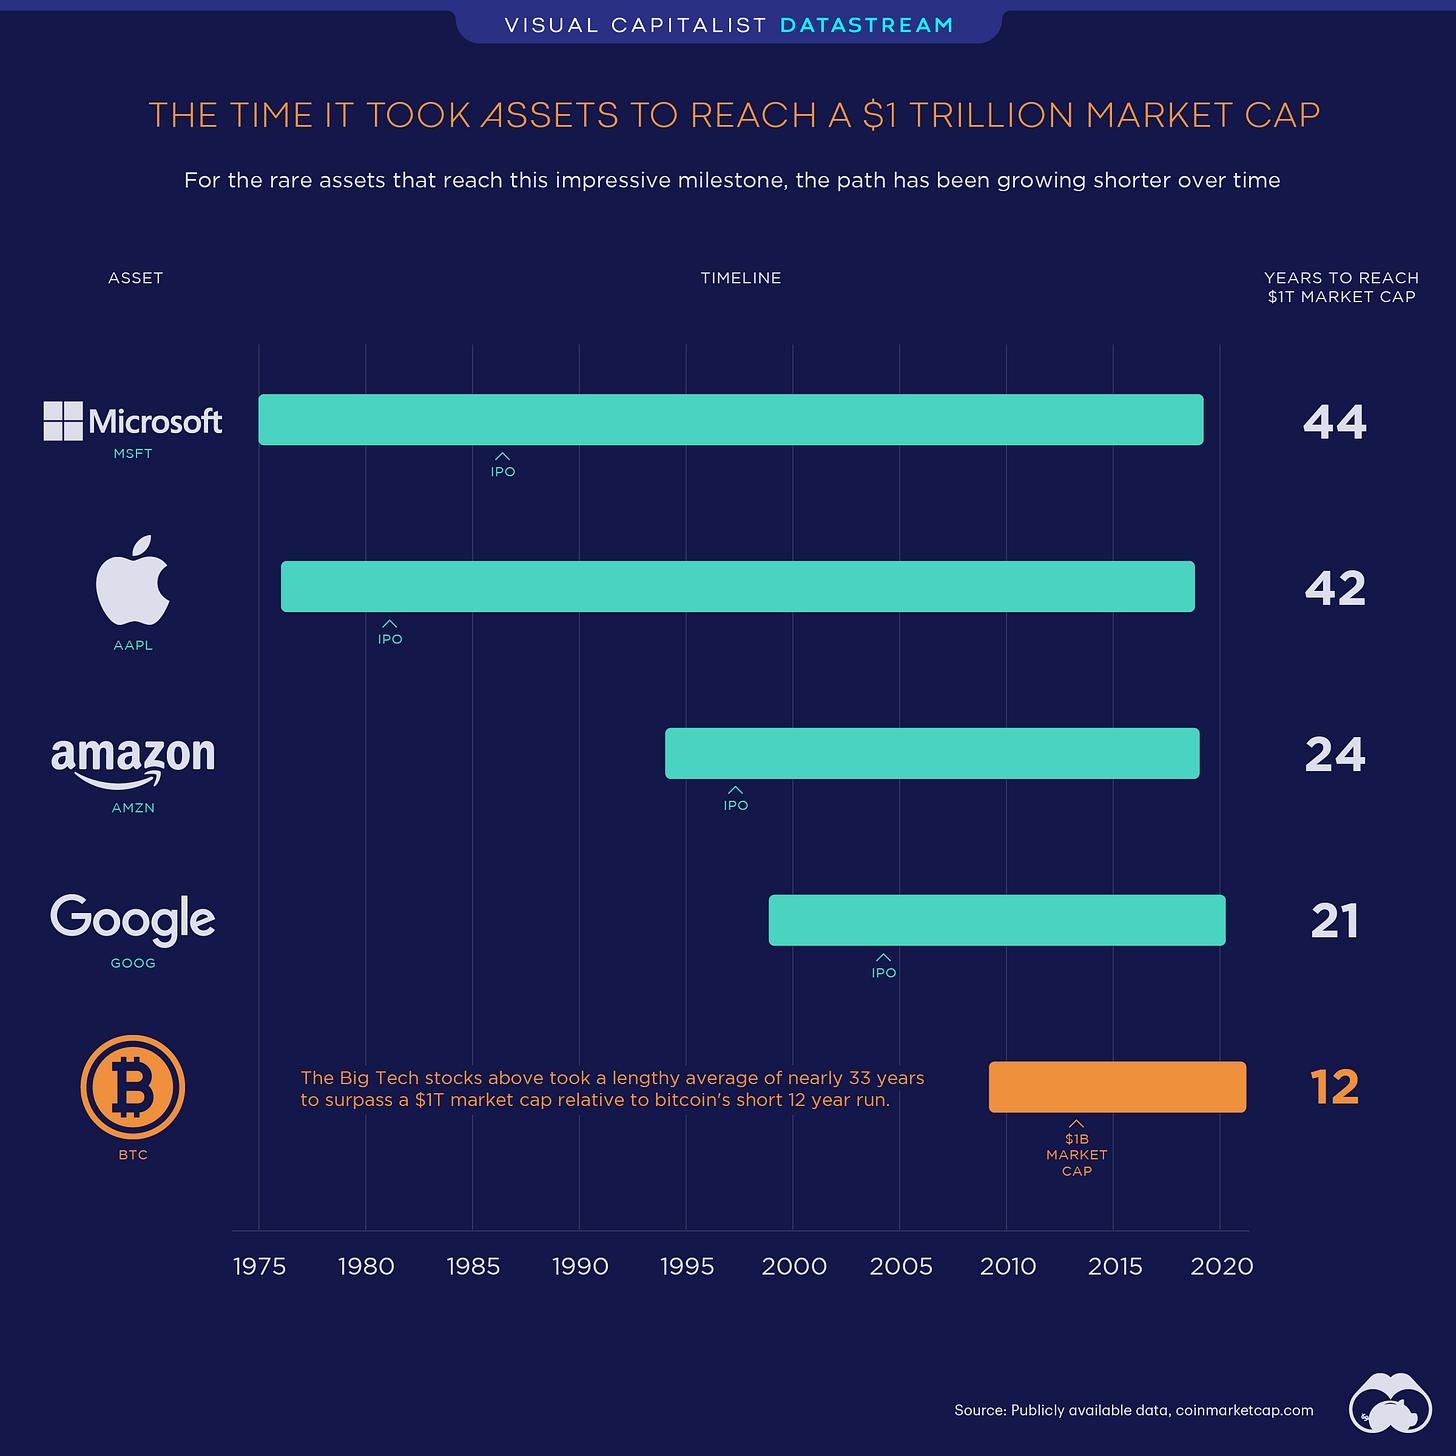 Bitcoin fastest asset to $1 trillion